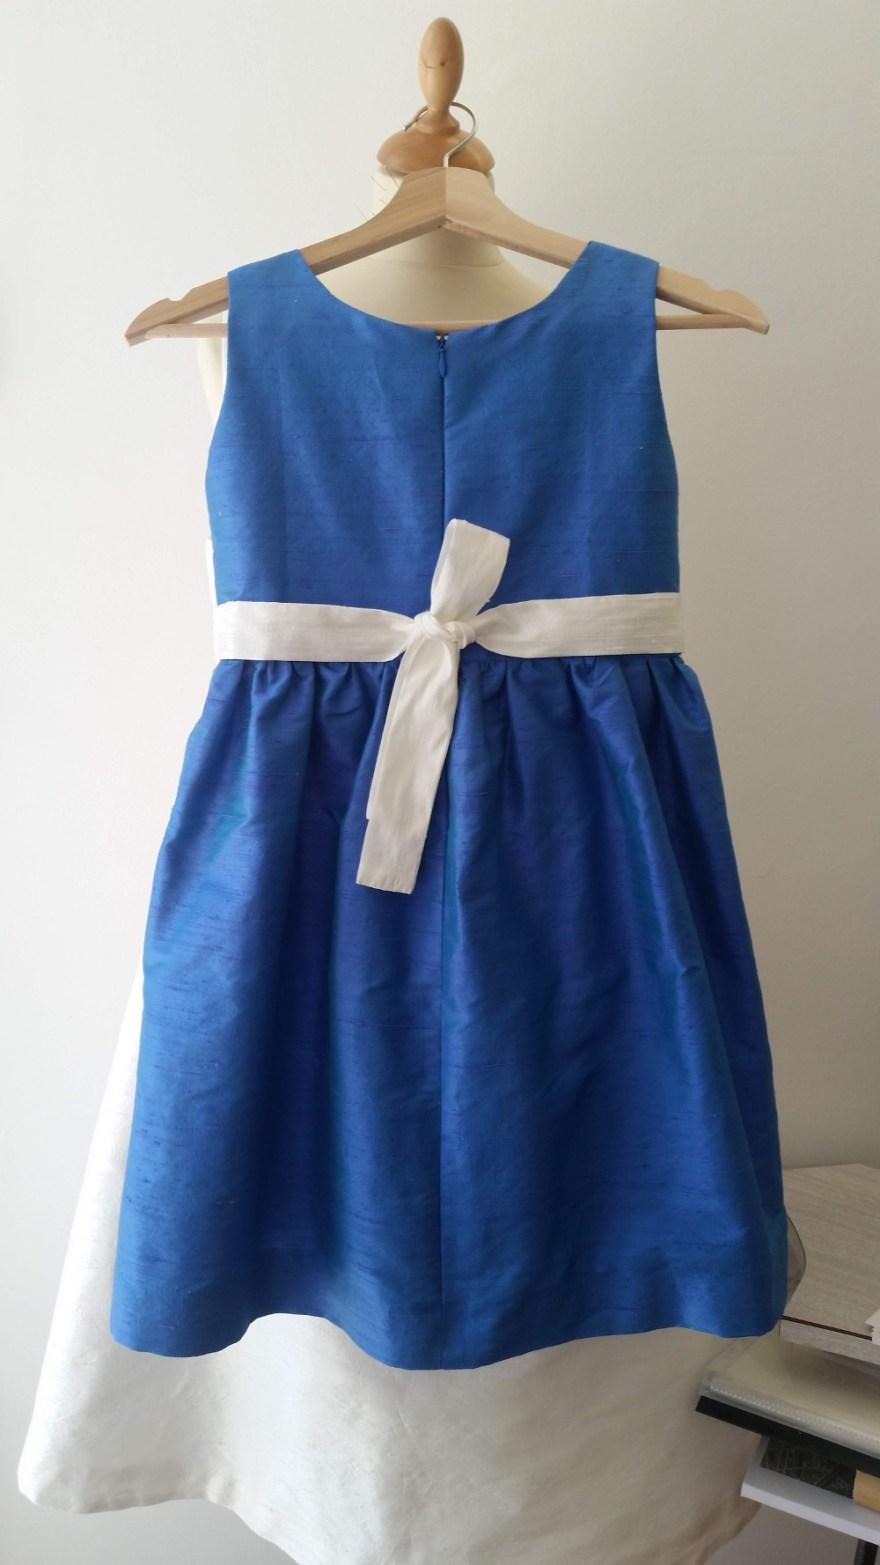 robe de cortège sur mesure